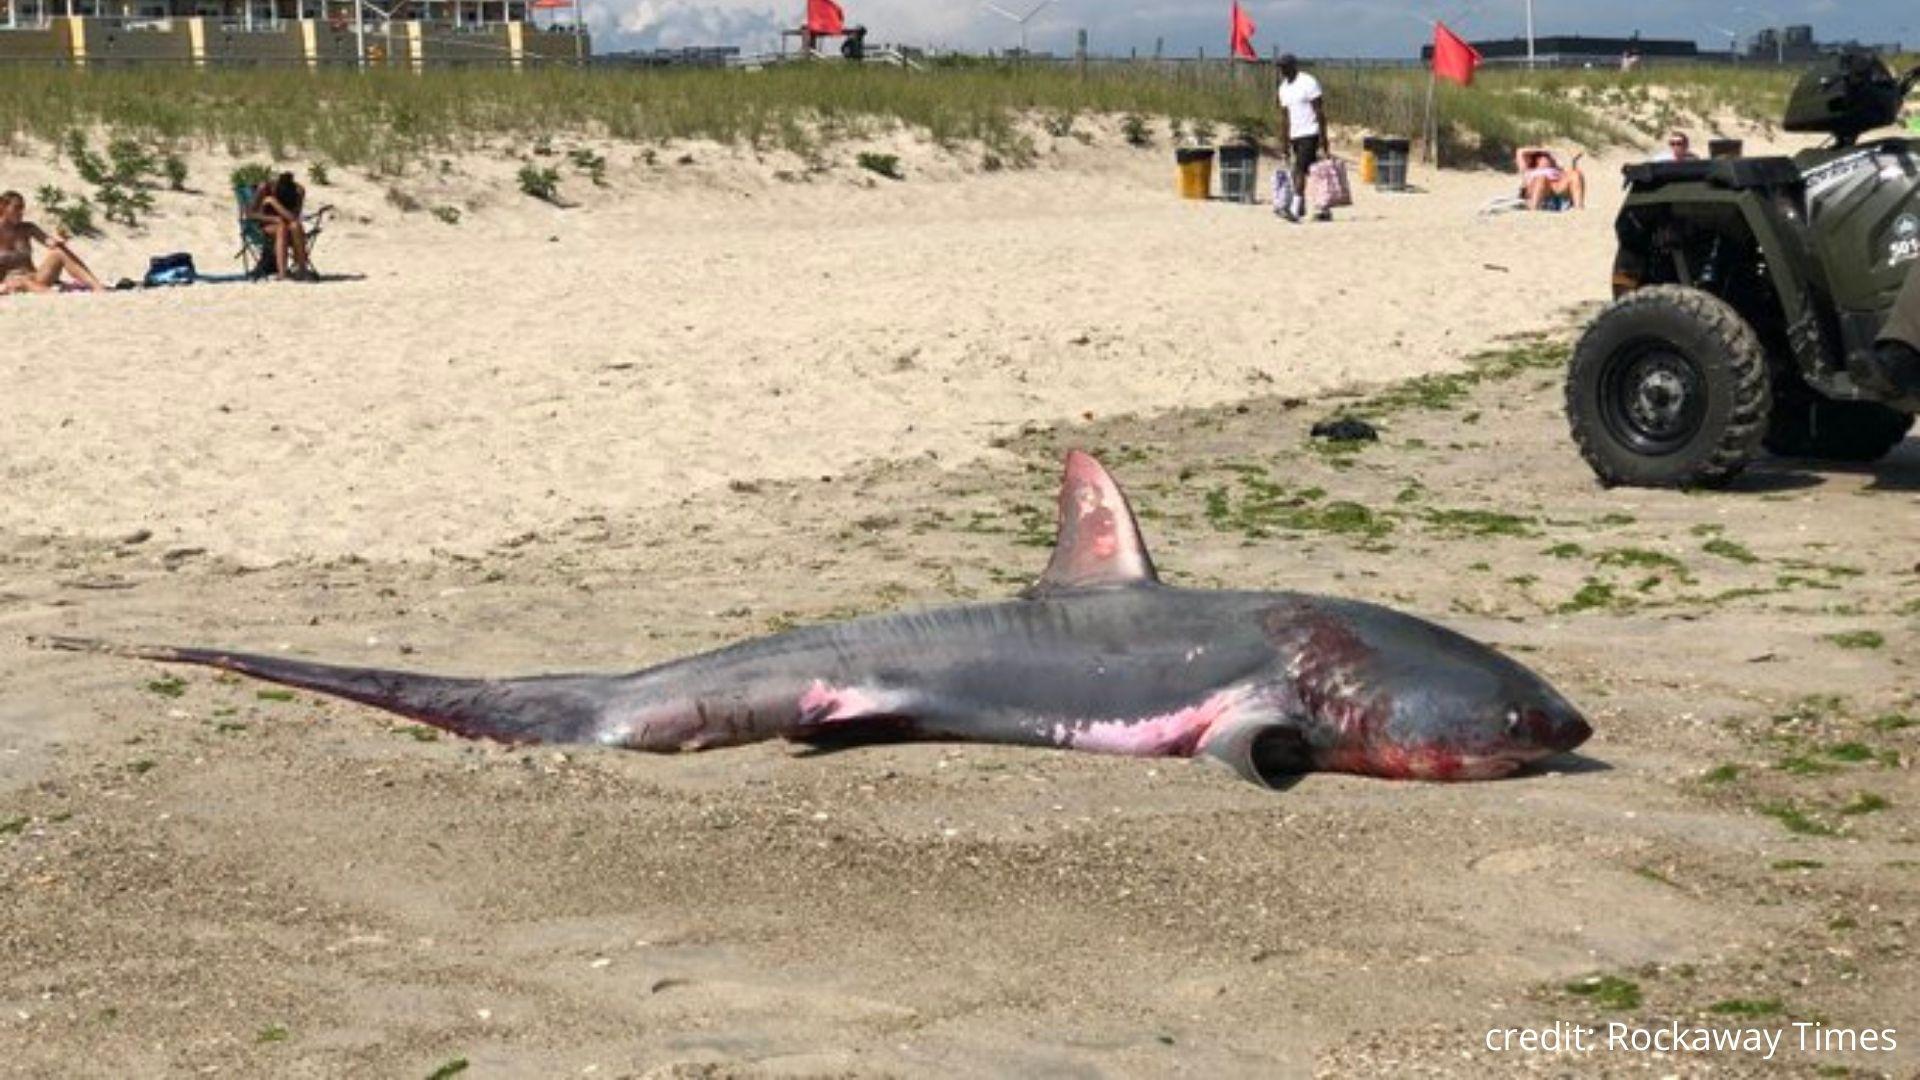 Shark washes up on Rockaway Beach in Queens